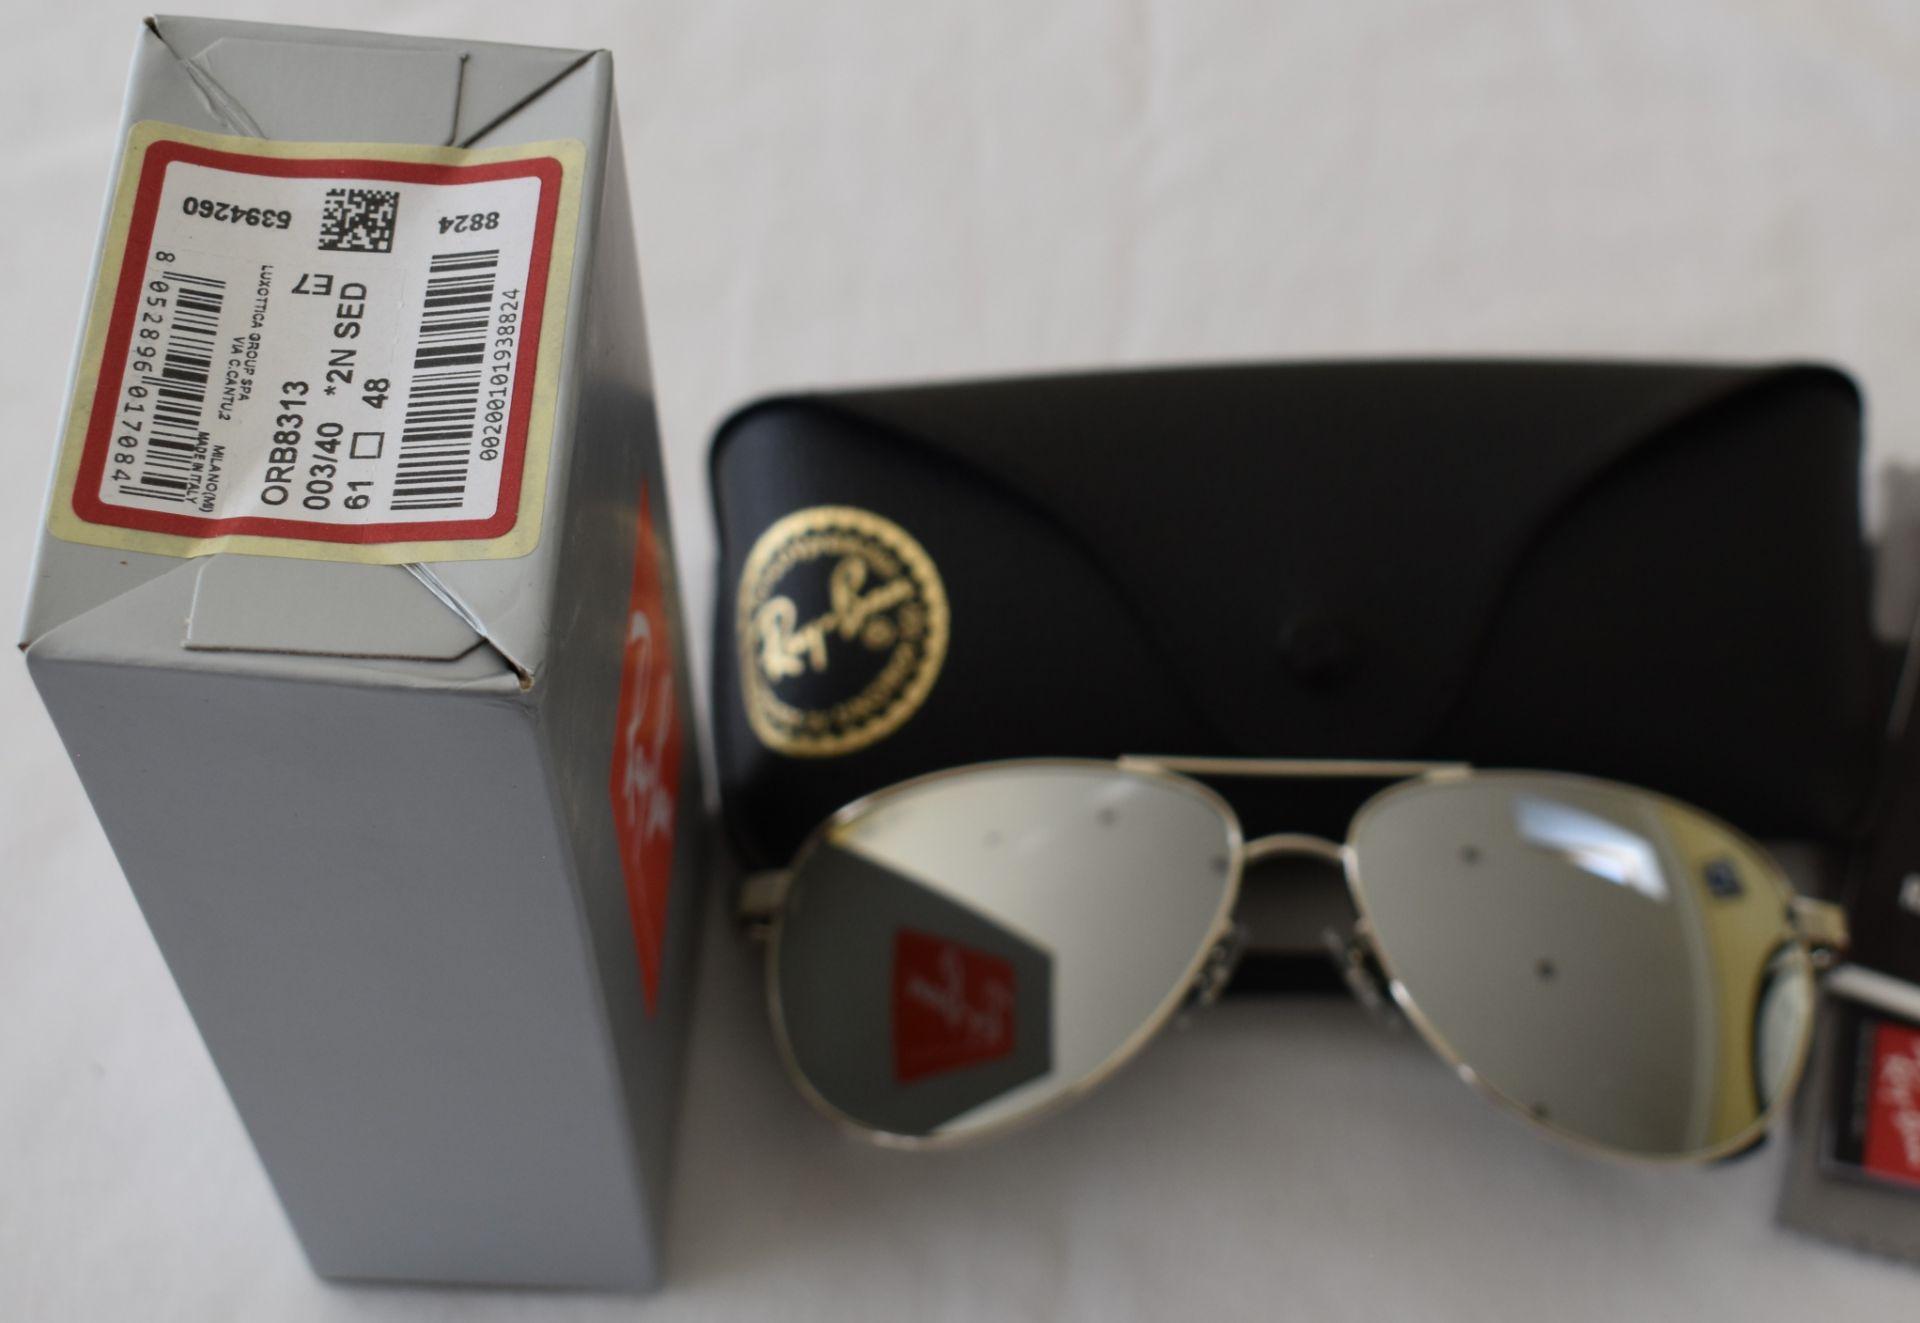 Ray Ban Sunglasses ORB8313 003/40 *2N - Image 2 of 2